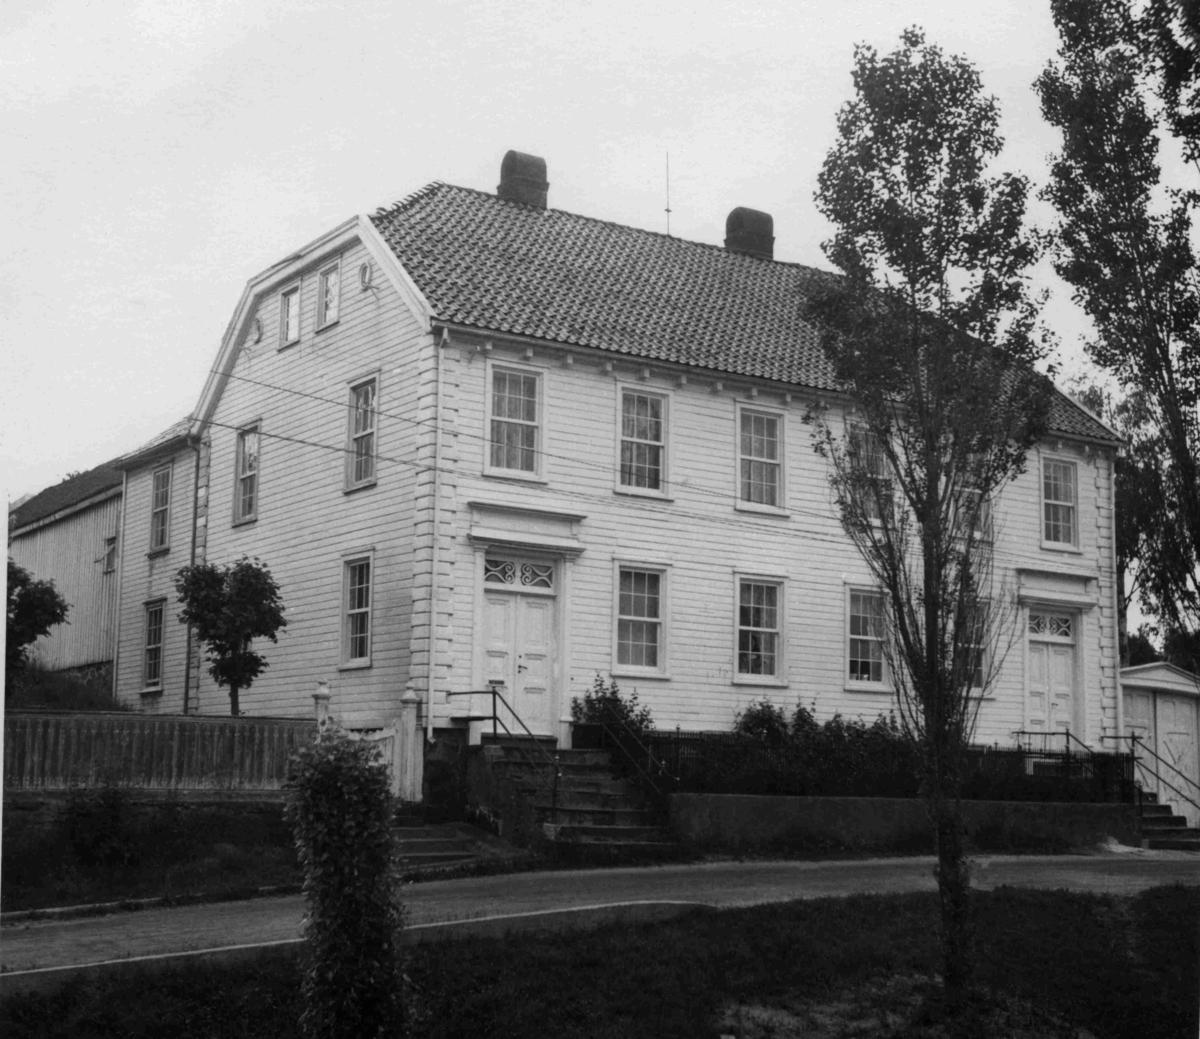 S. N. Hansens hus